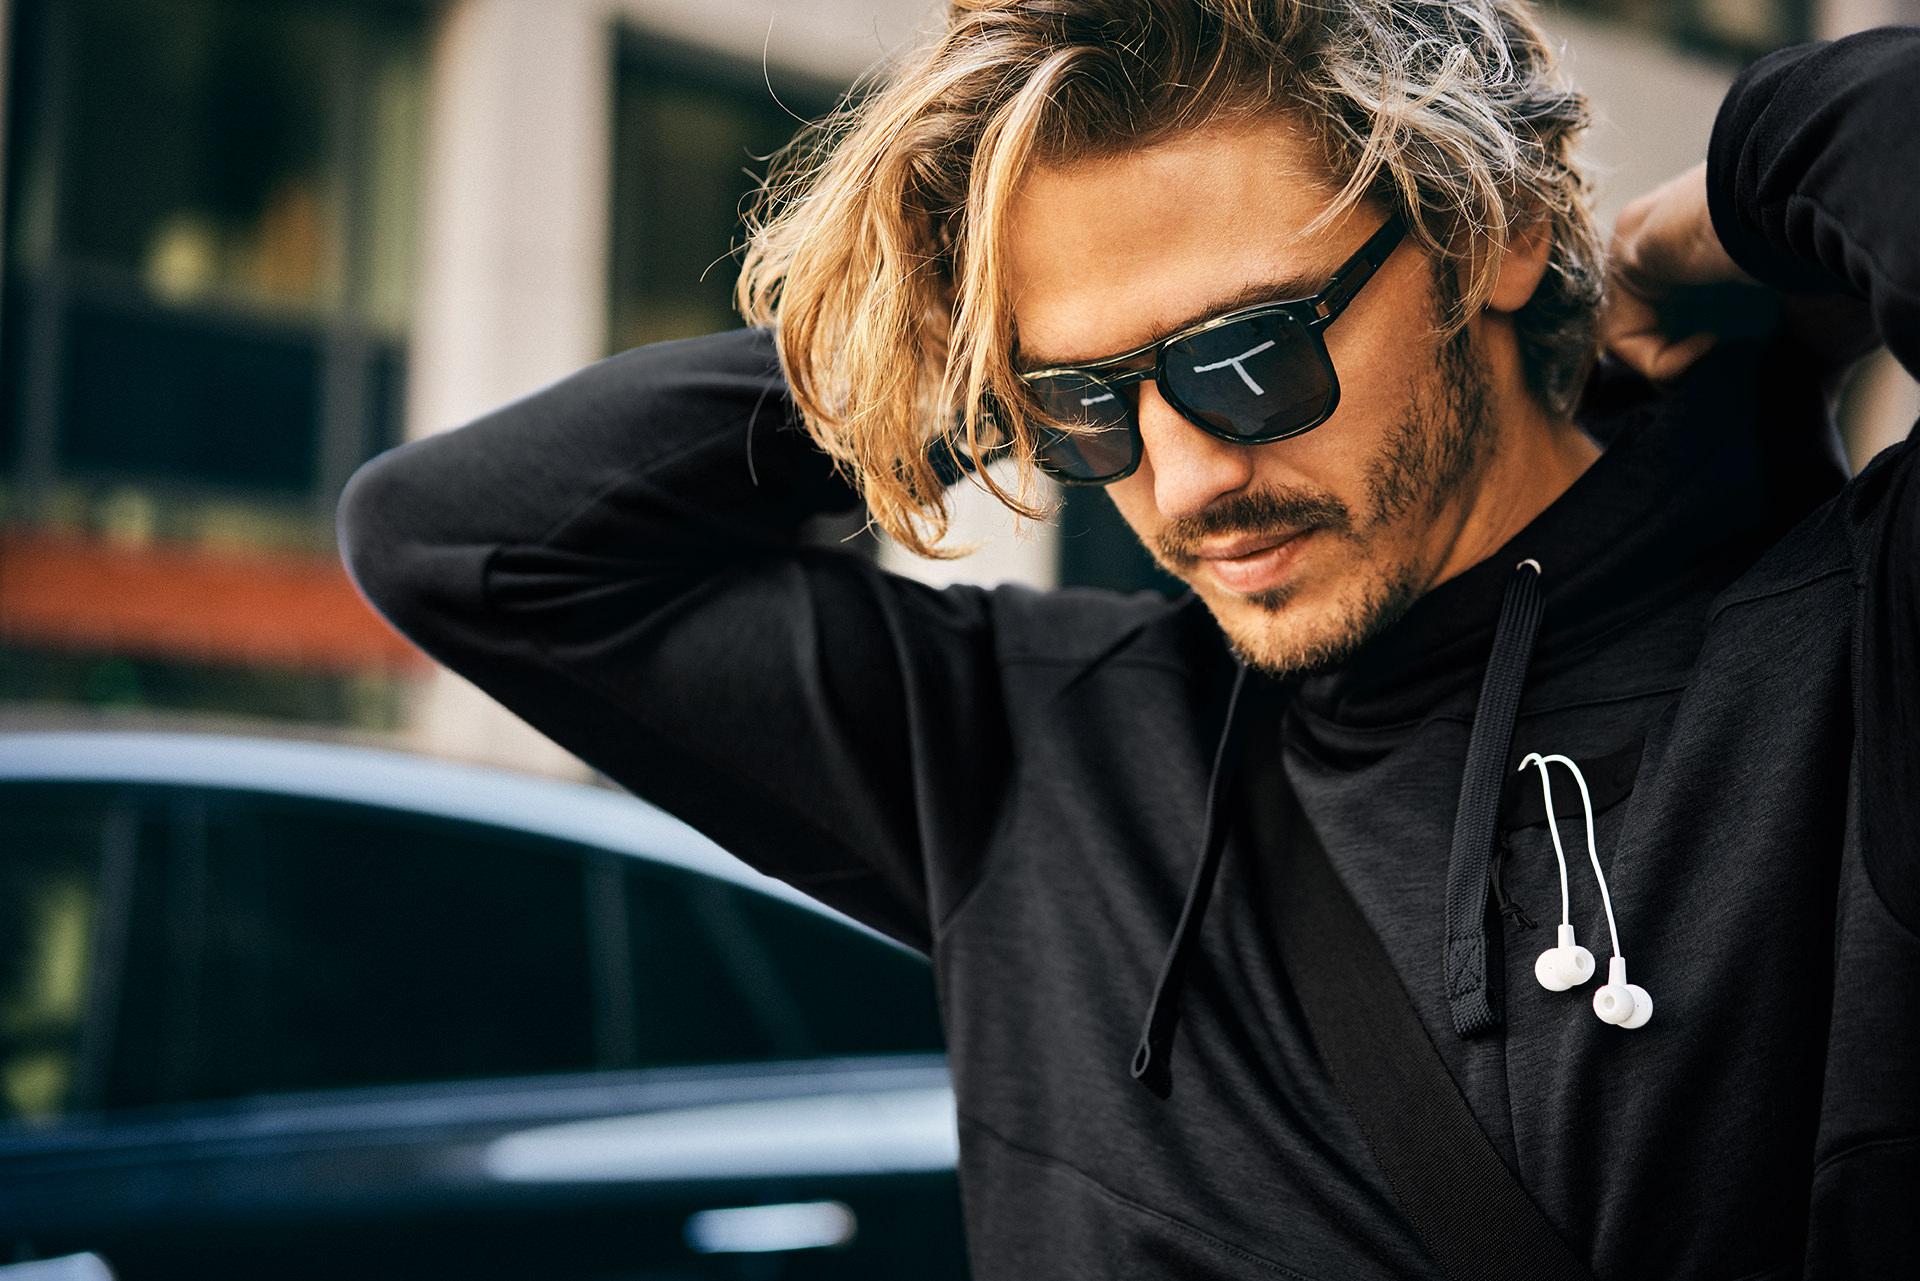 mann-sonnenbrille-hoodie-kopfhoerer-stadt